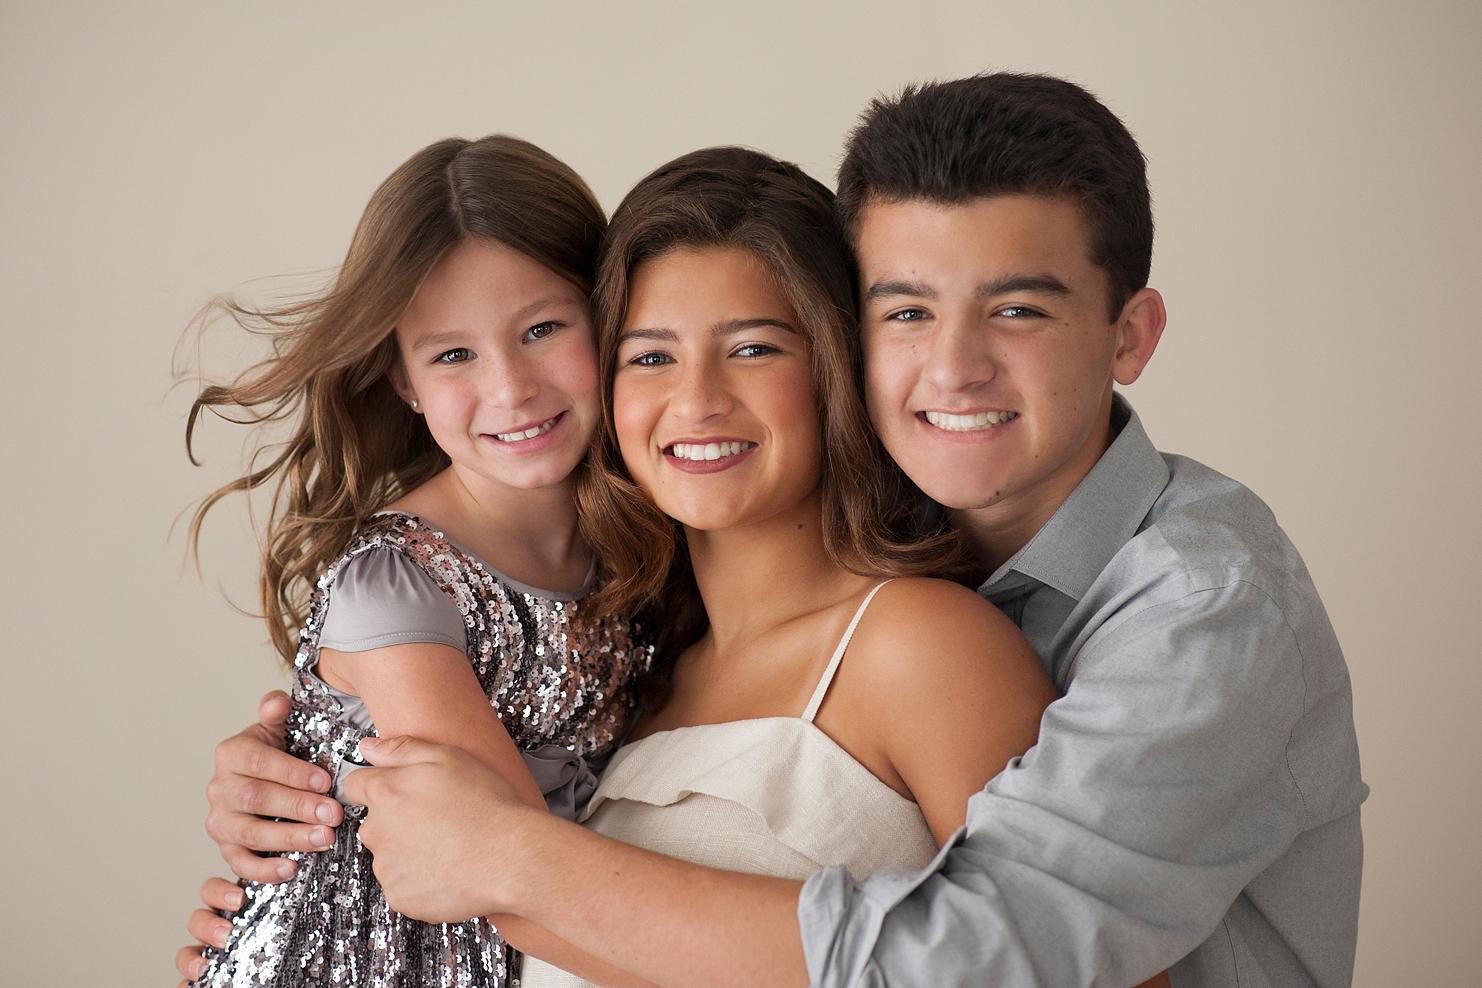 18-portrait-children-brother-sisters-wind-hair-studio2.jpg